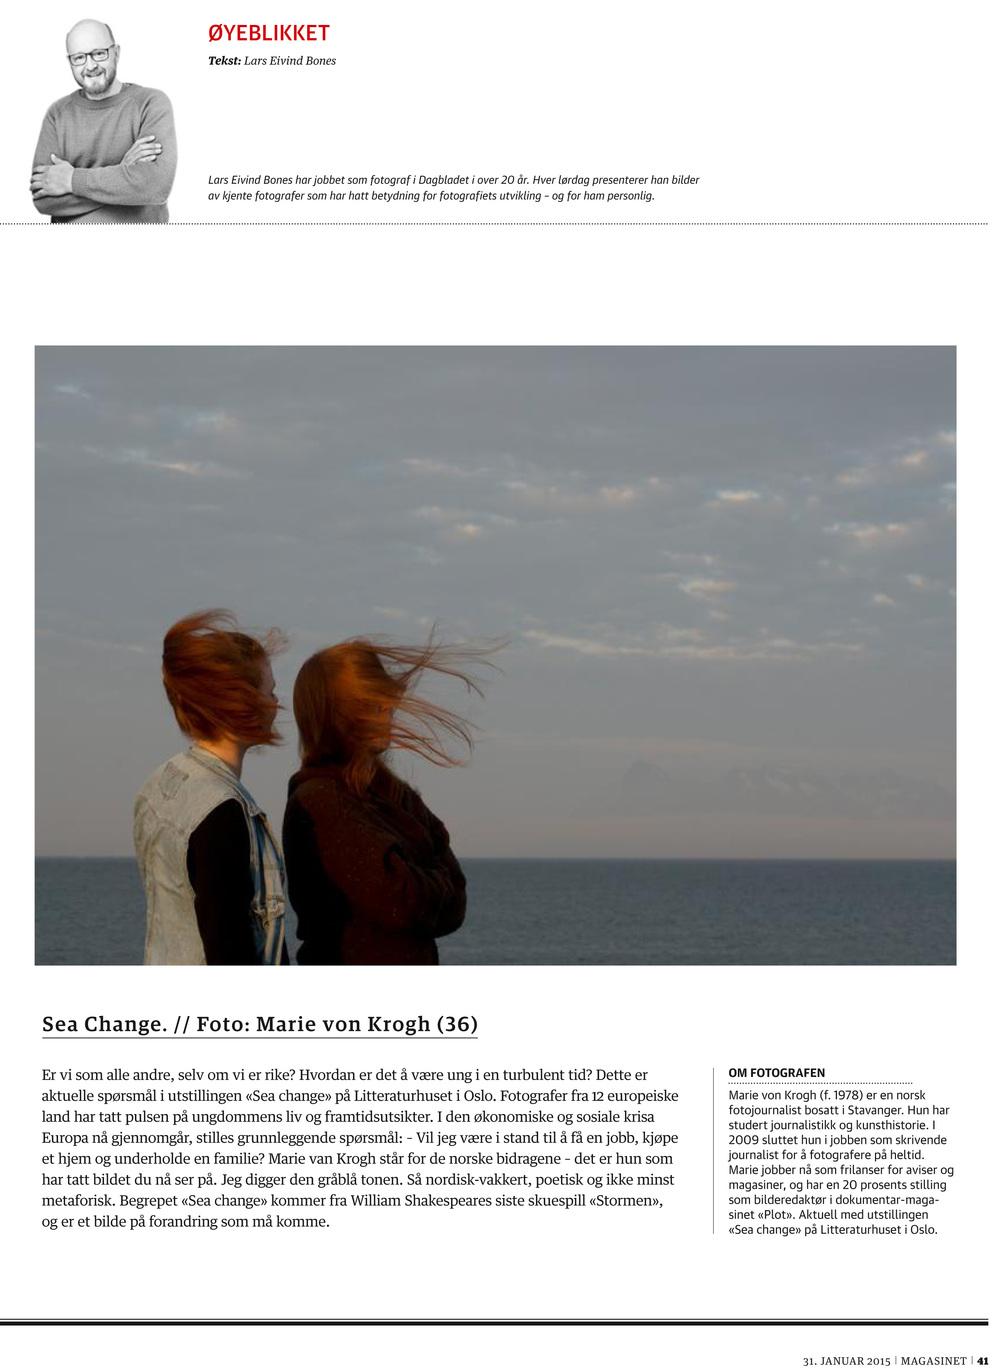 Øyeblikket, Dagbladet Magasinet